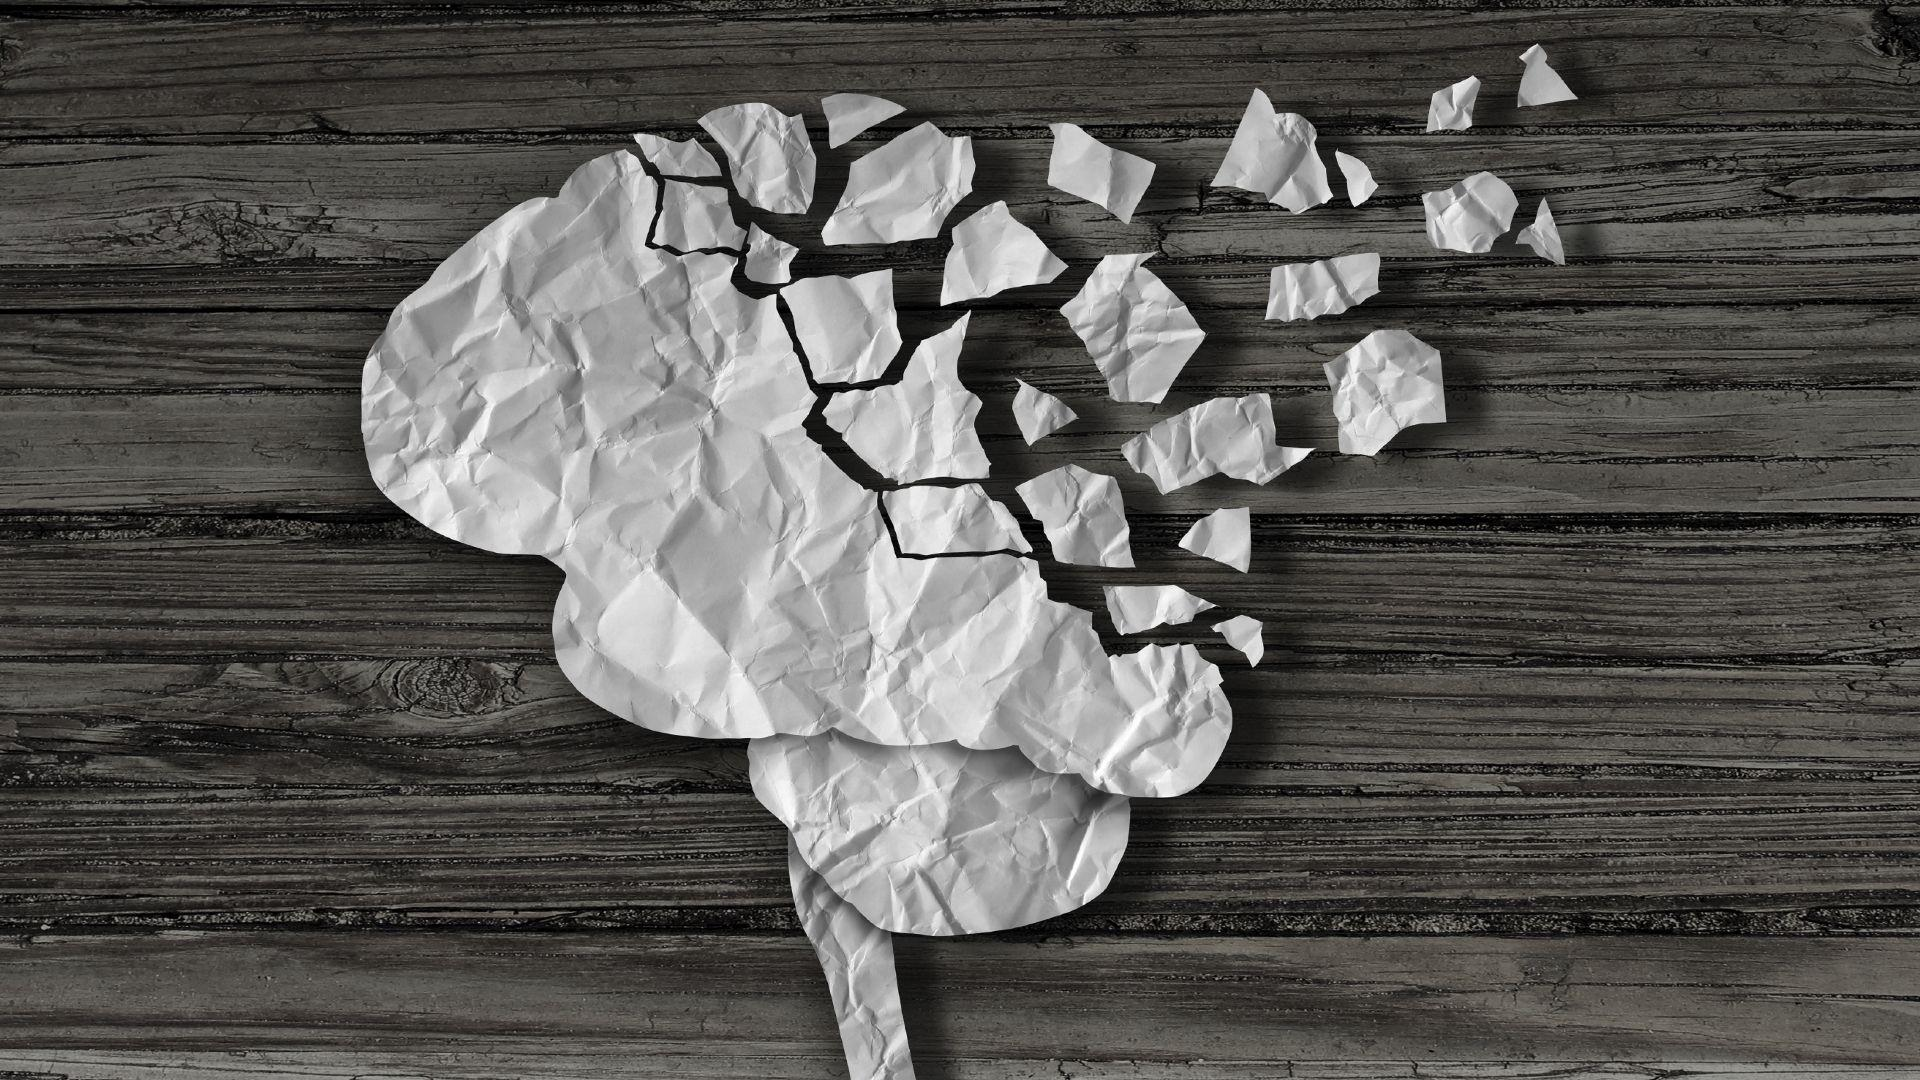 Нарушение ритма сердца резко увеличивает риск развития деменции